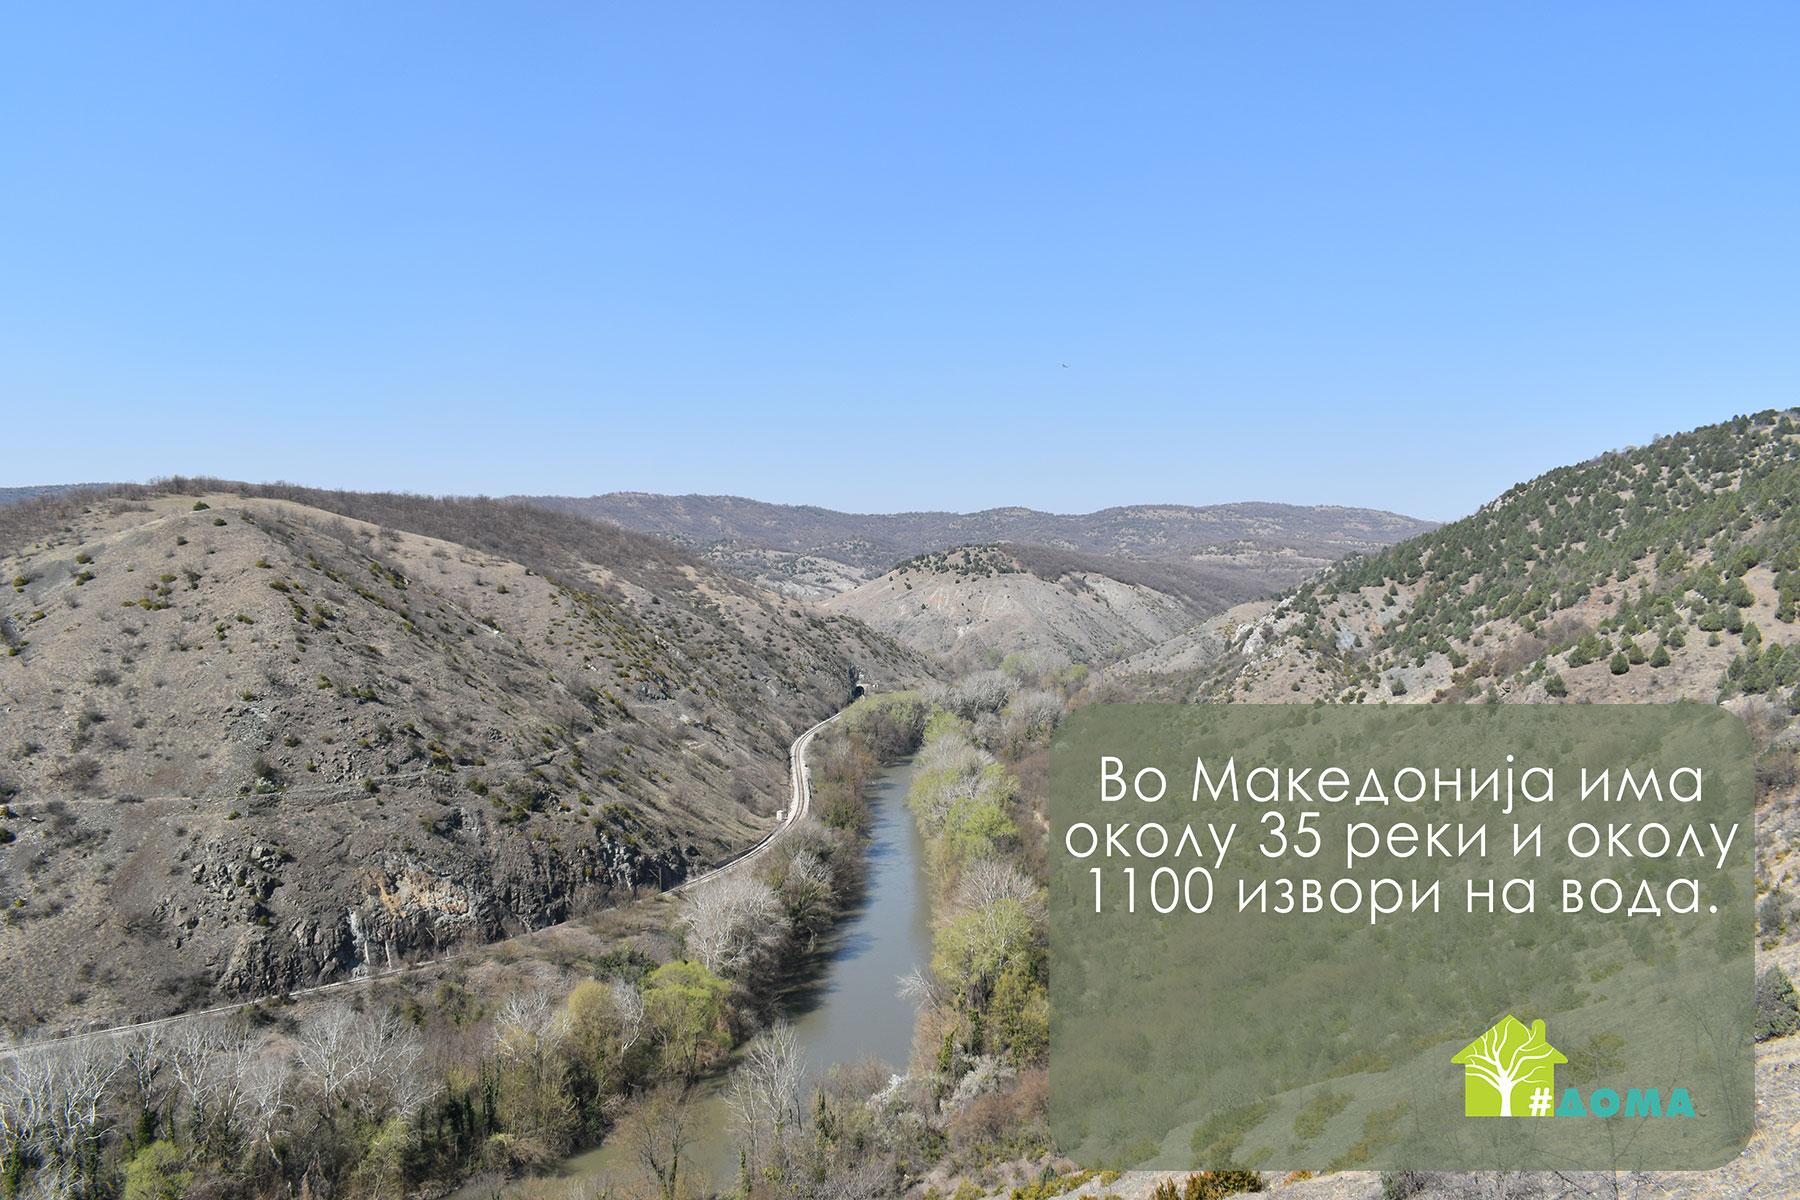 Makedonskite reki